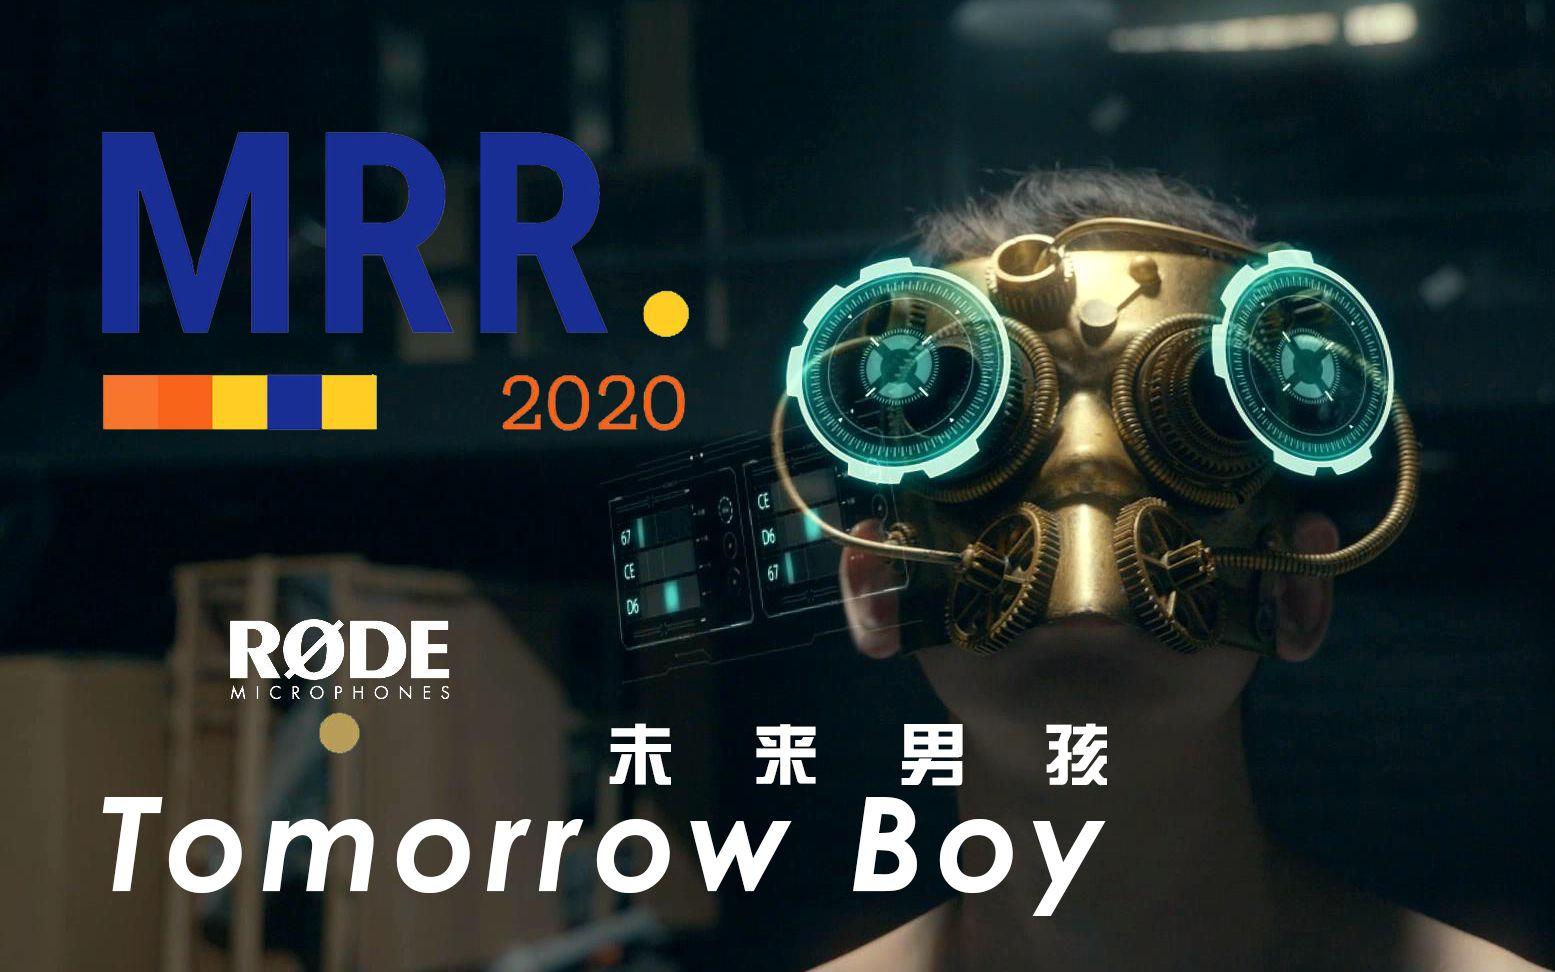 My RØDE Reel 2020 - Tomorrow Boy 未来男孩 - by Jacky Chen